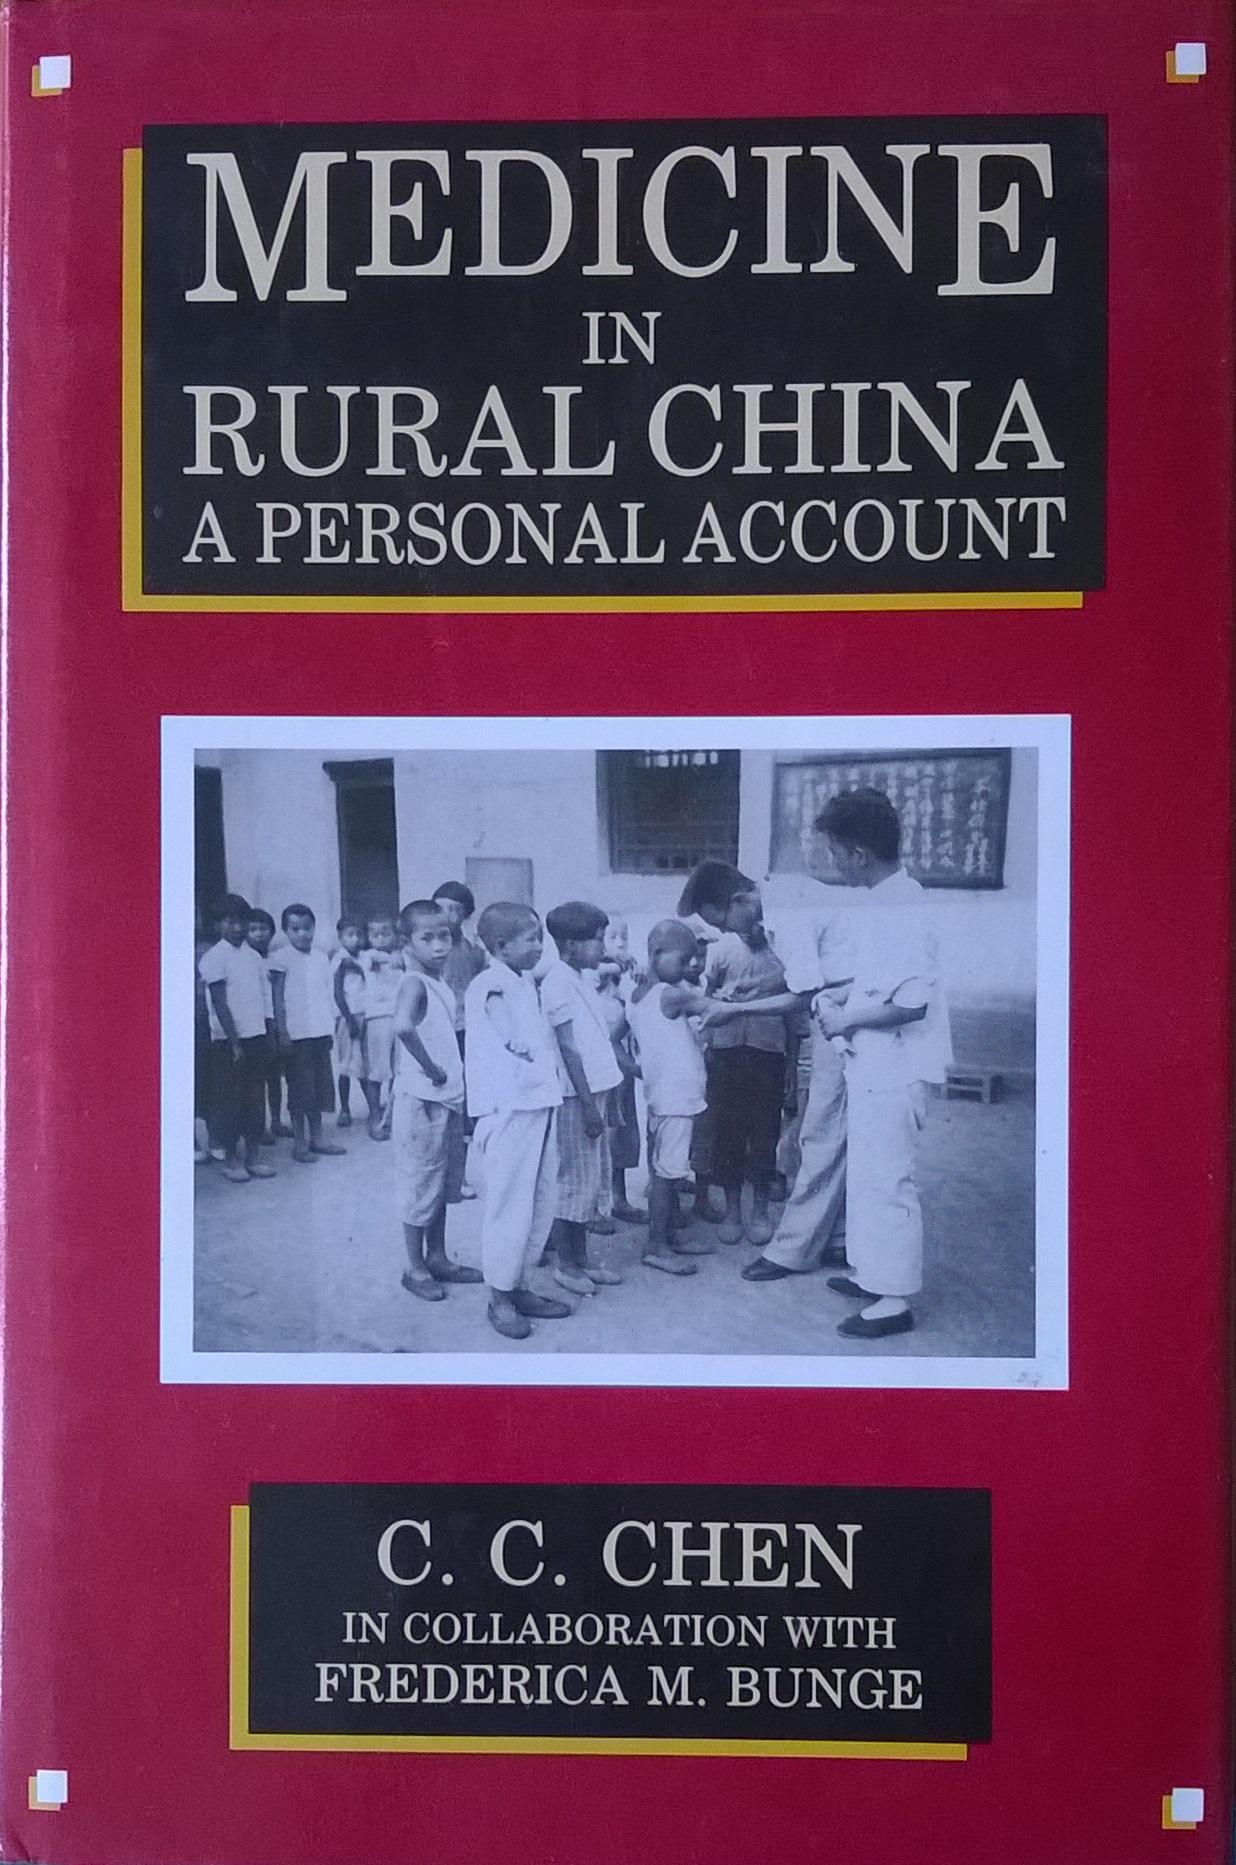 Medicine in Rural China